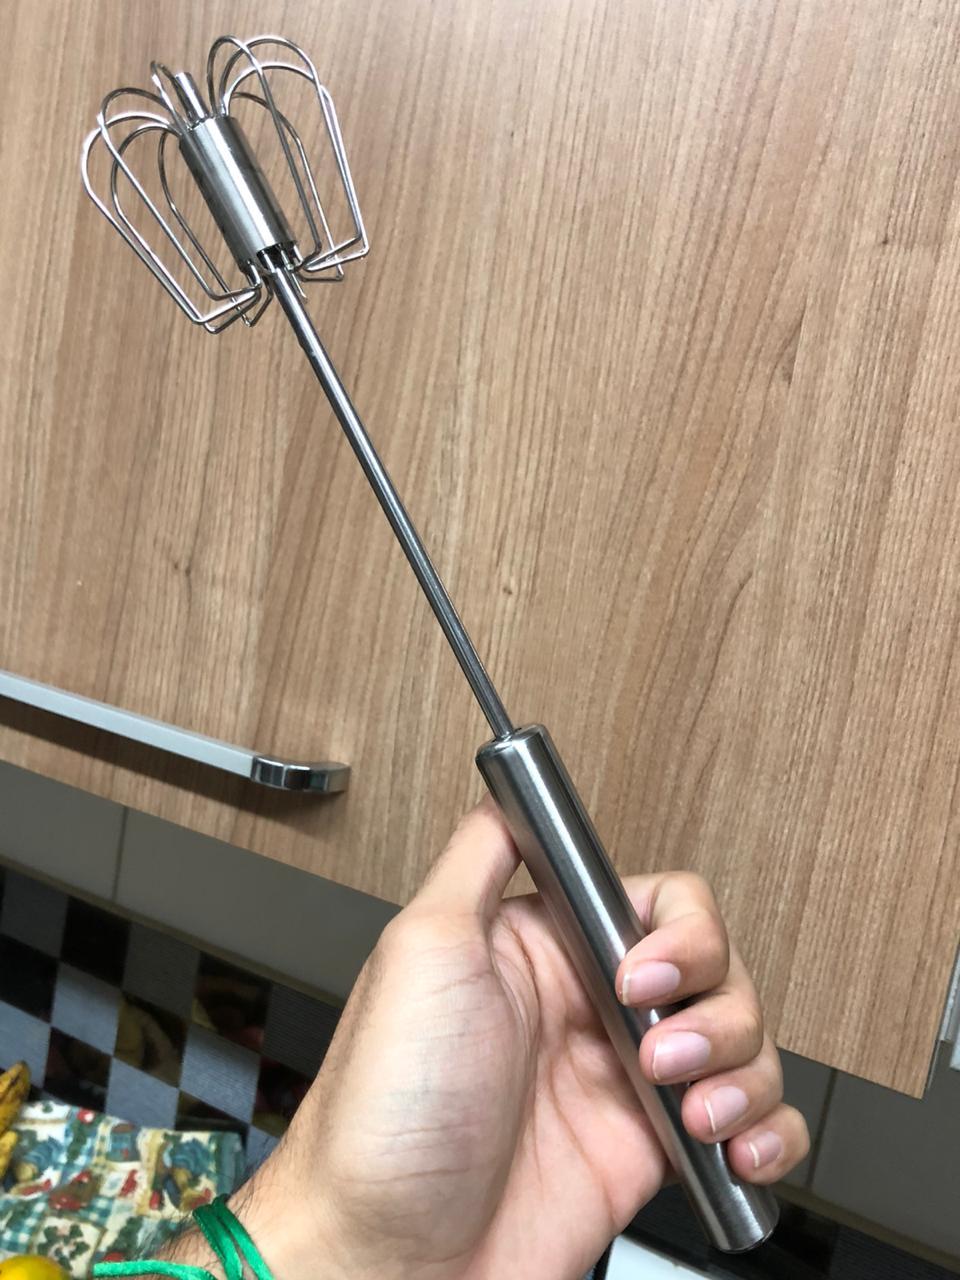 Batedor de ovos semi automático fouet profissional prateado de aço inox 31cm MimoStyle